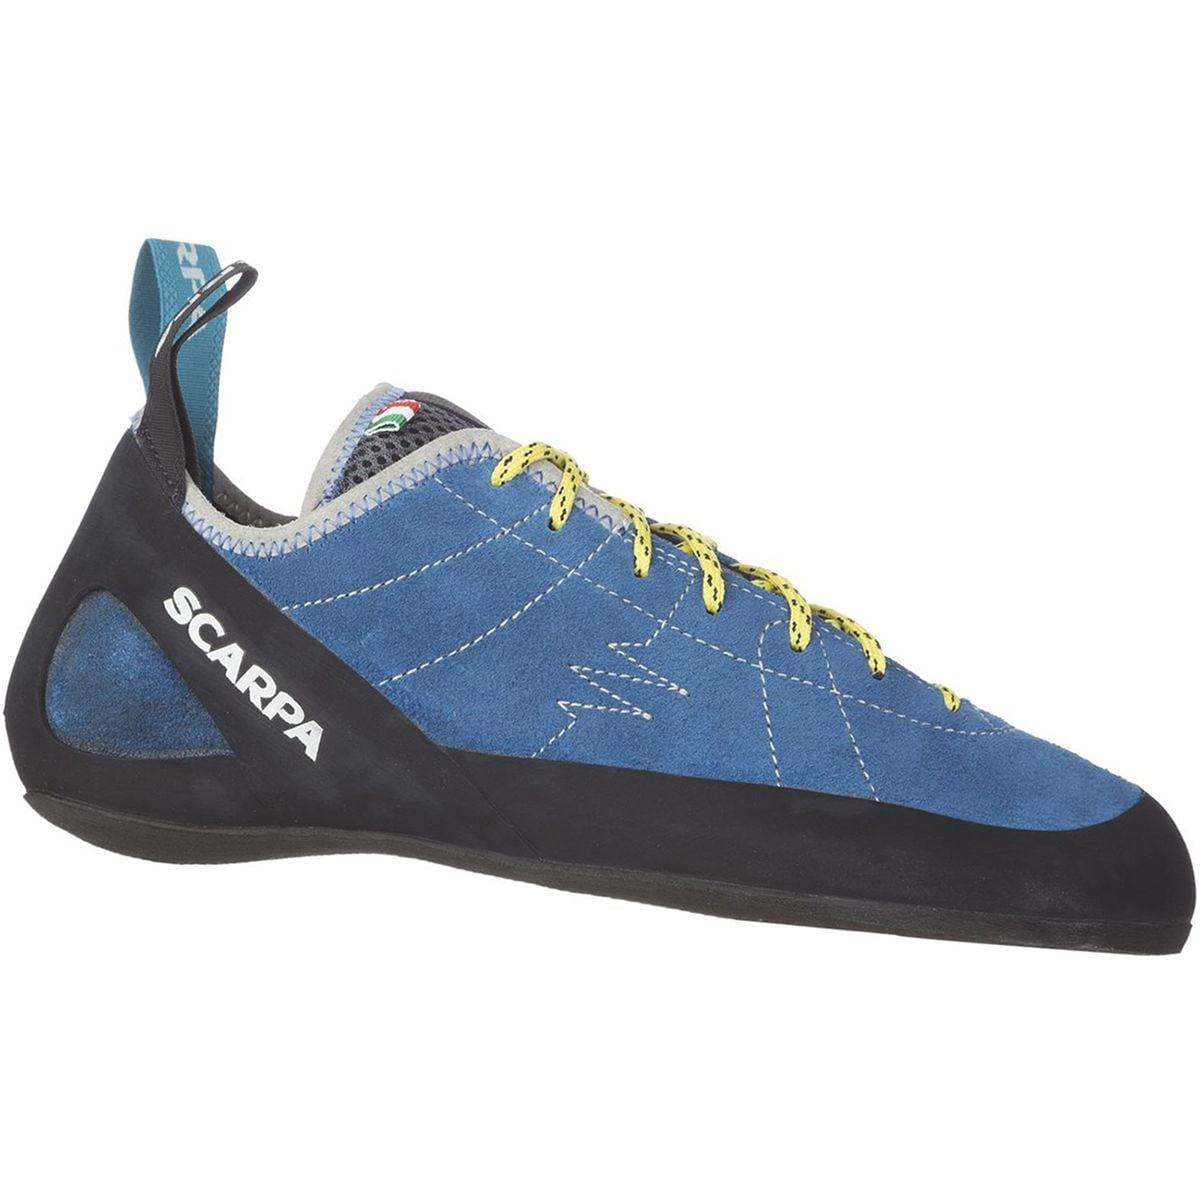 Scarpa Climbing Shoes Australia  Images Scarpa Climbing Shoes For F Save  Scarpa